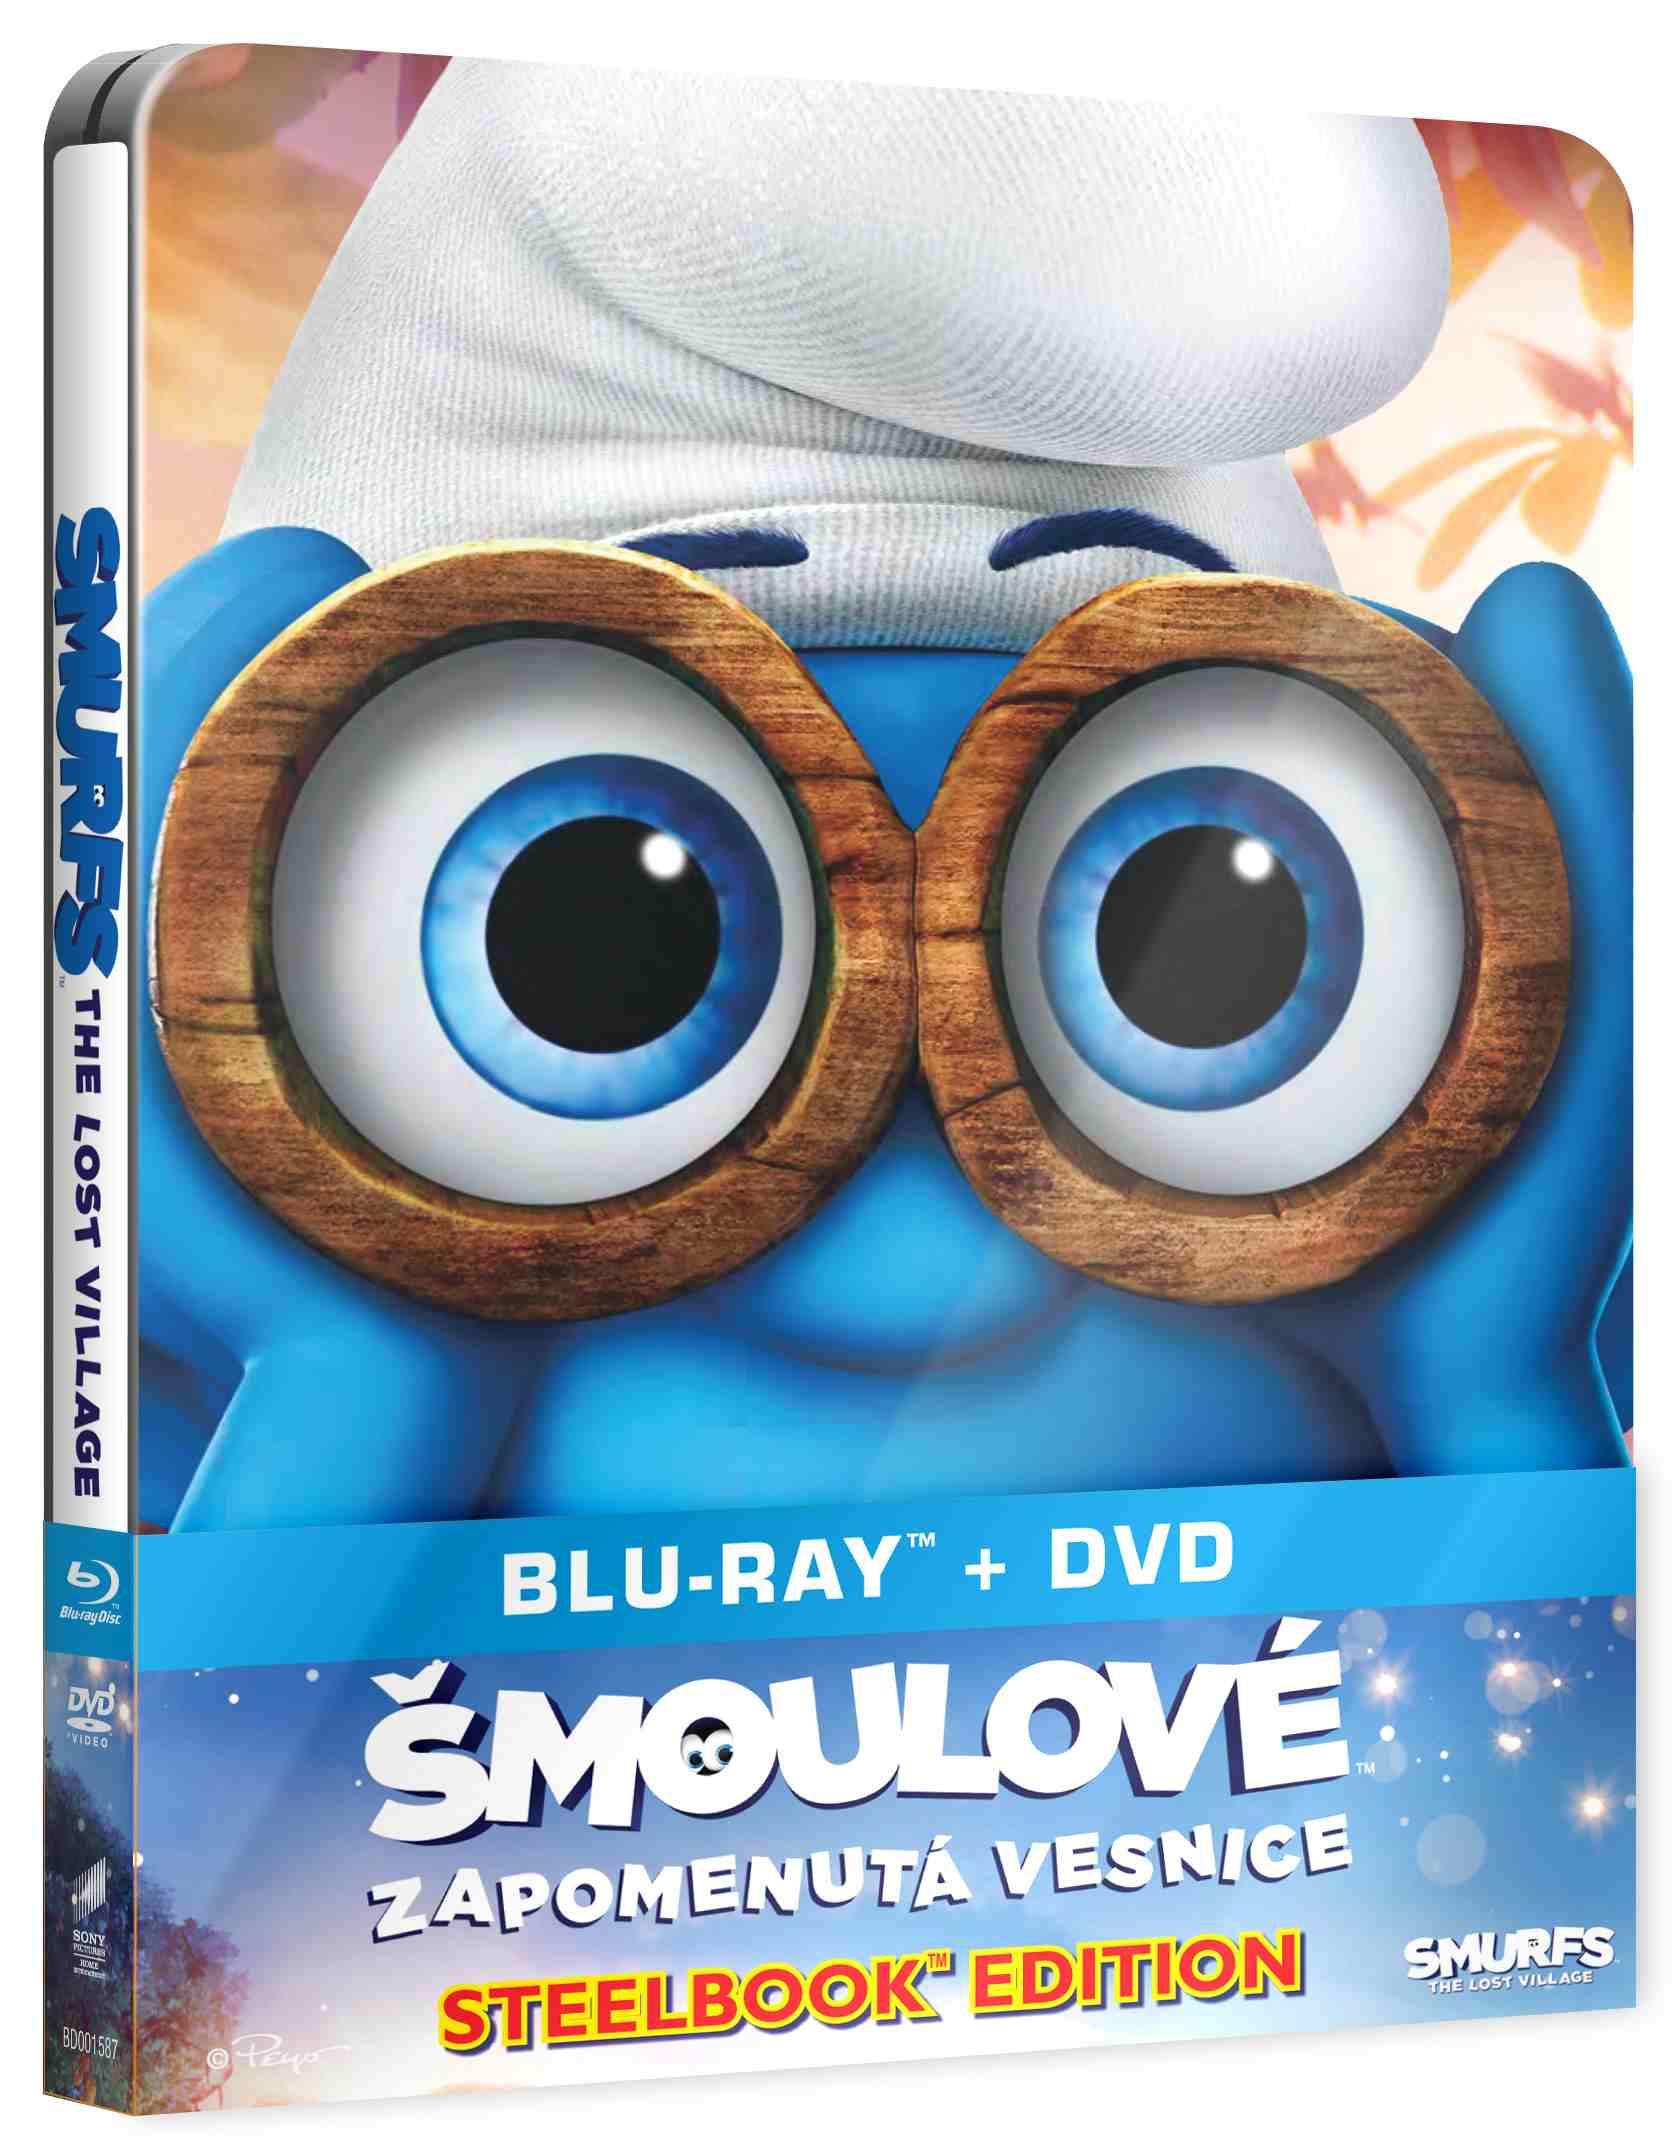 ŠMOULOVÉ: ZAPOMENUTÁ VESNICE - Blu-ray STEELBOOK (BD + DVD)